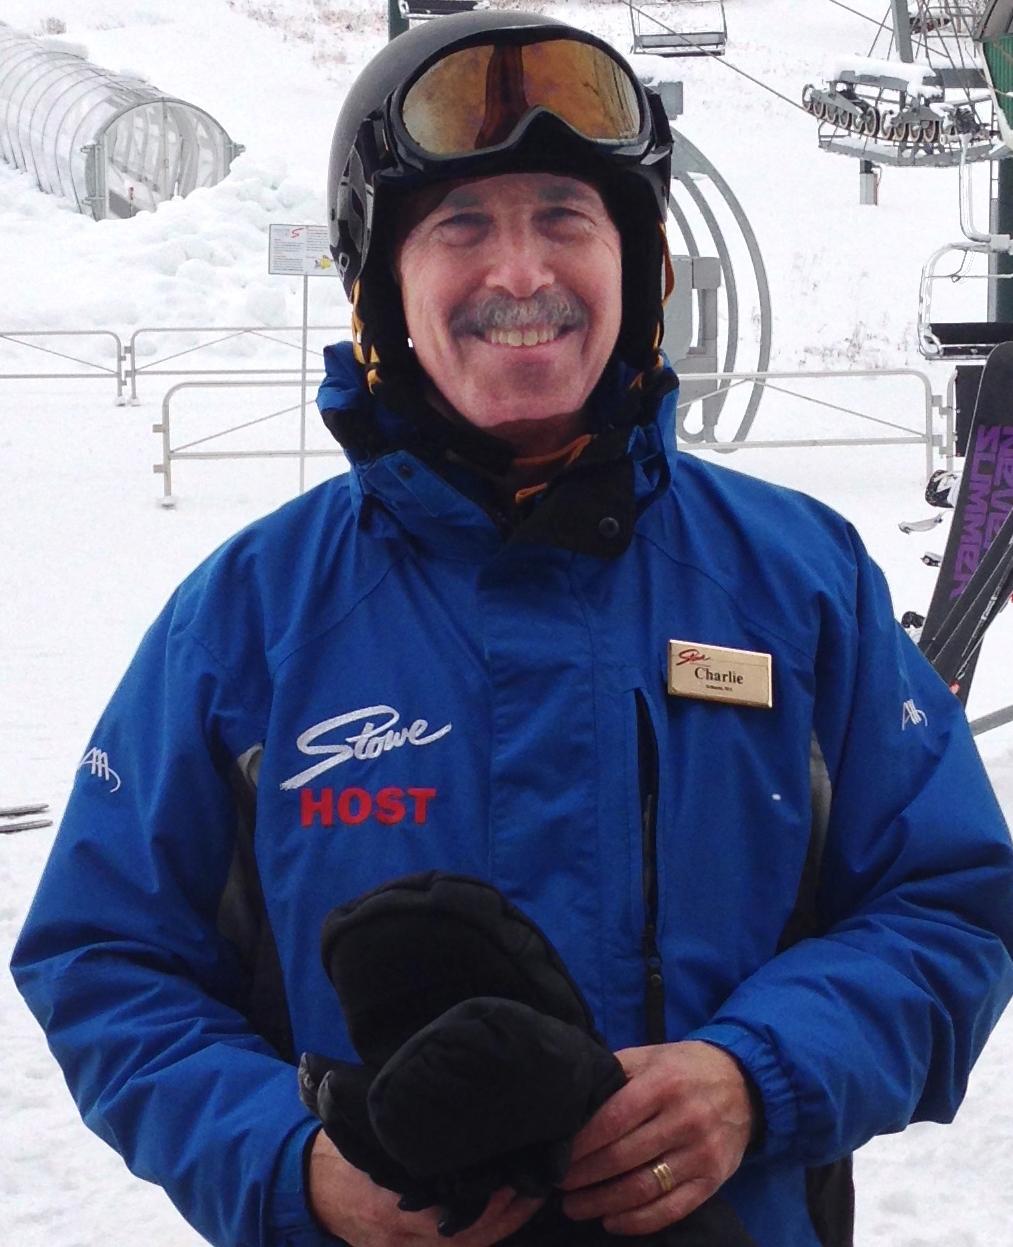 IMG_2114 2014-12-11 CA Stowe Host Portrait CROPPED.jpg